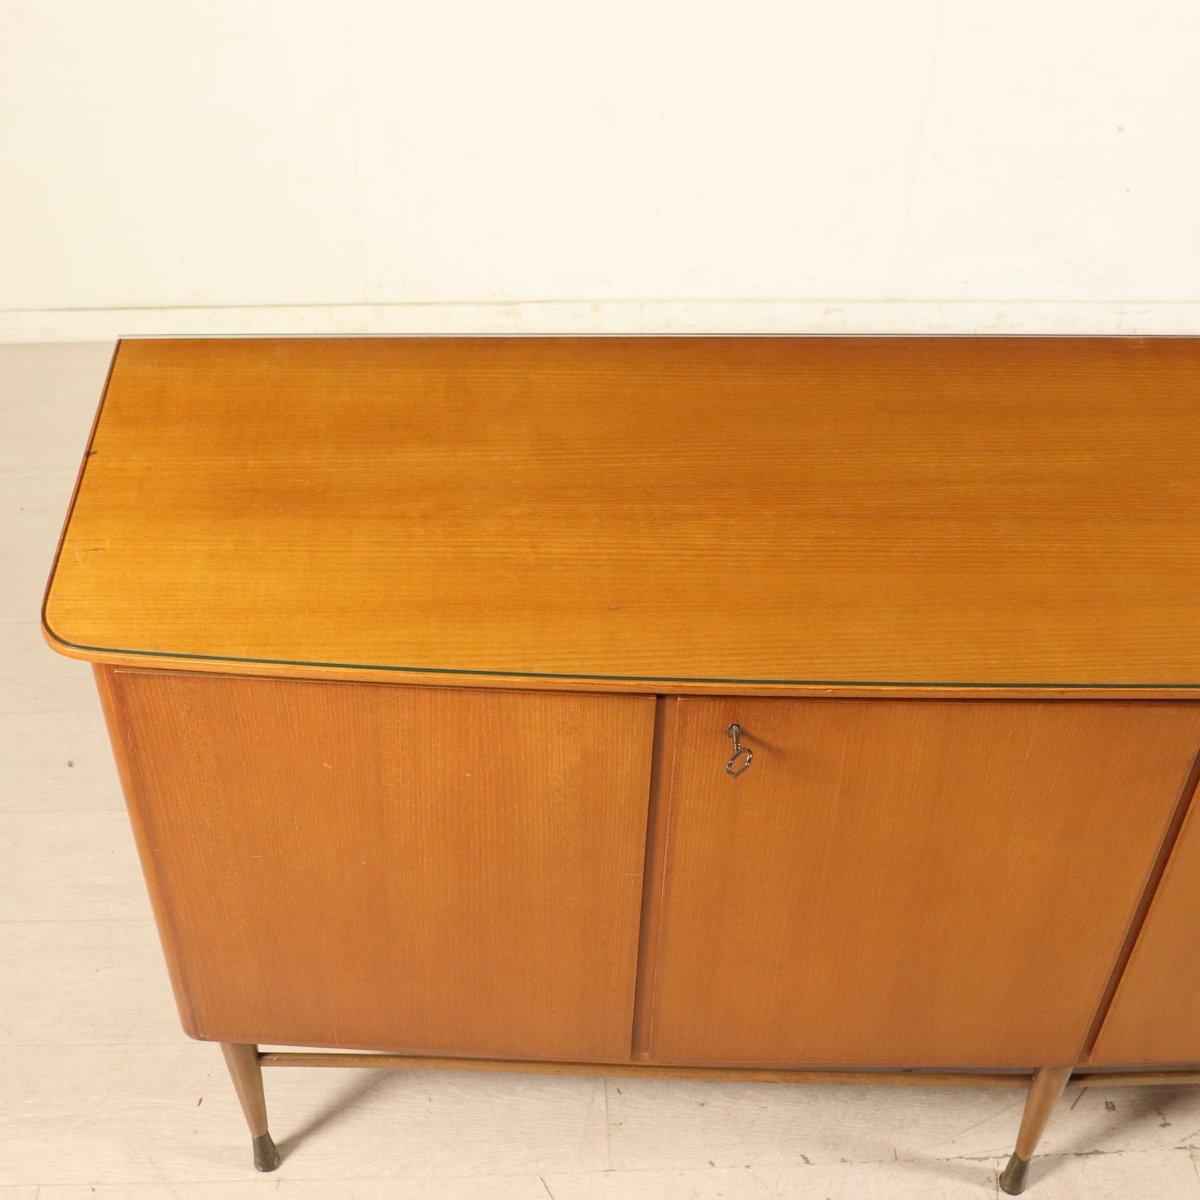 italienisches buffet aus mahagoni furnier glas messing 1950er bei pamono kaufen. Black Bedroom Furniture Sets. Home Design Ideas